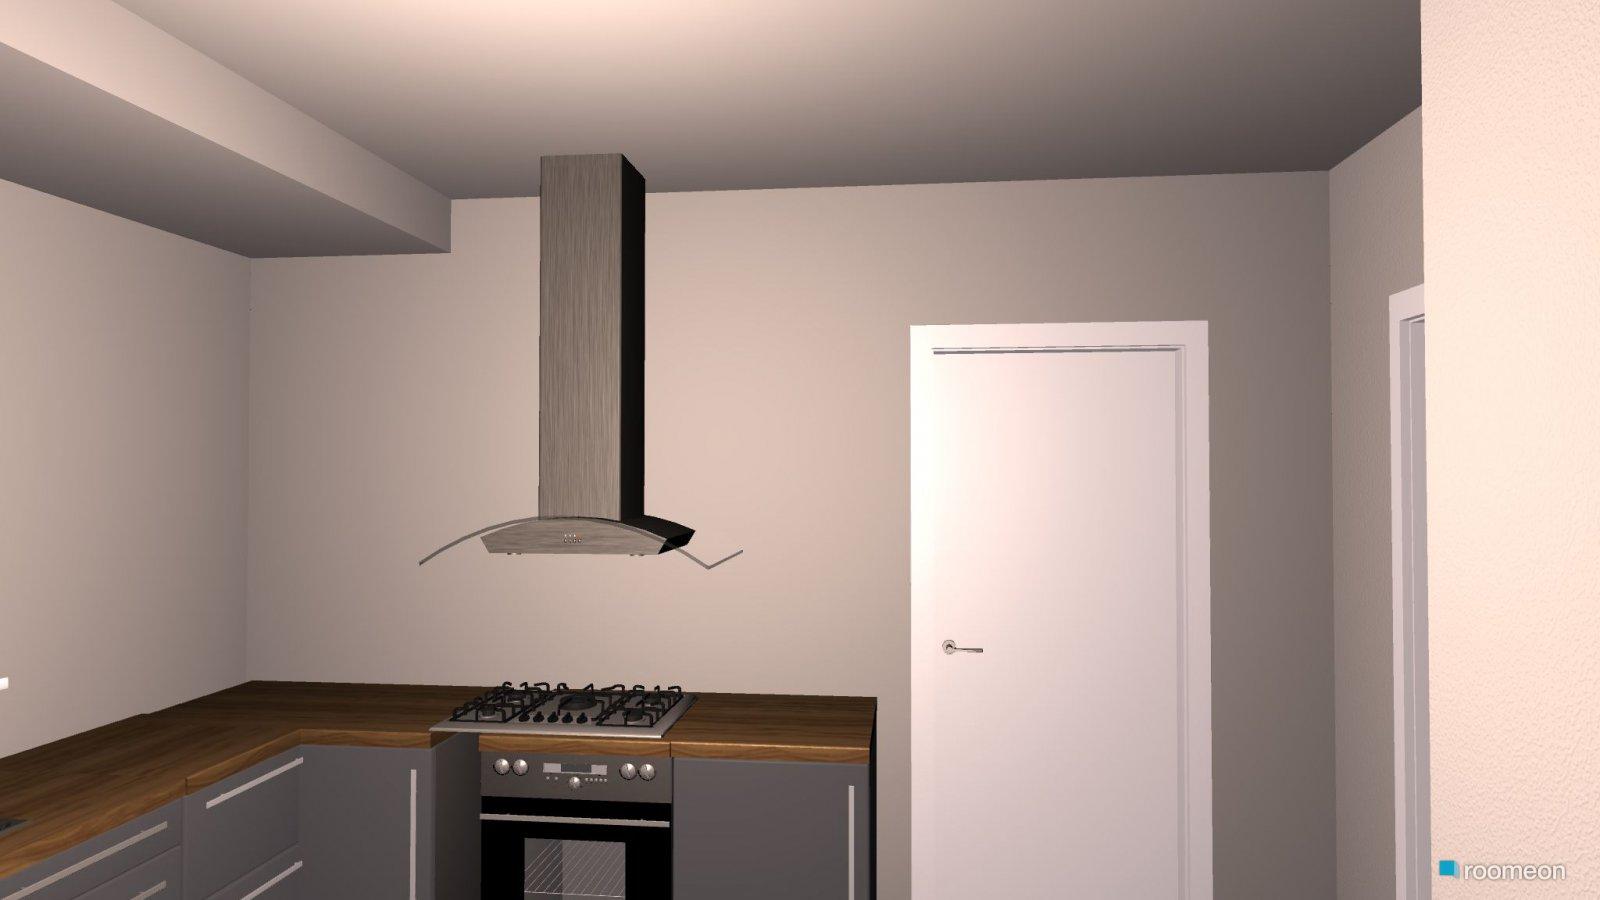 Bora dunstabzug in ikea küche kosten küche inkl geräte